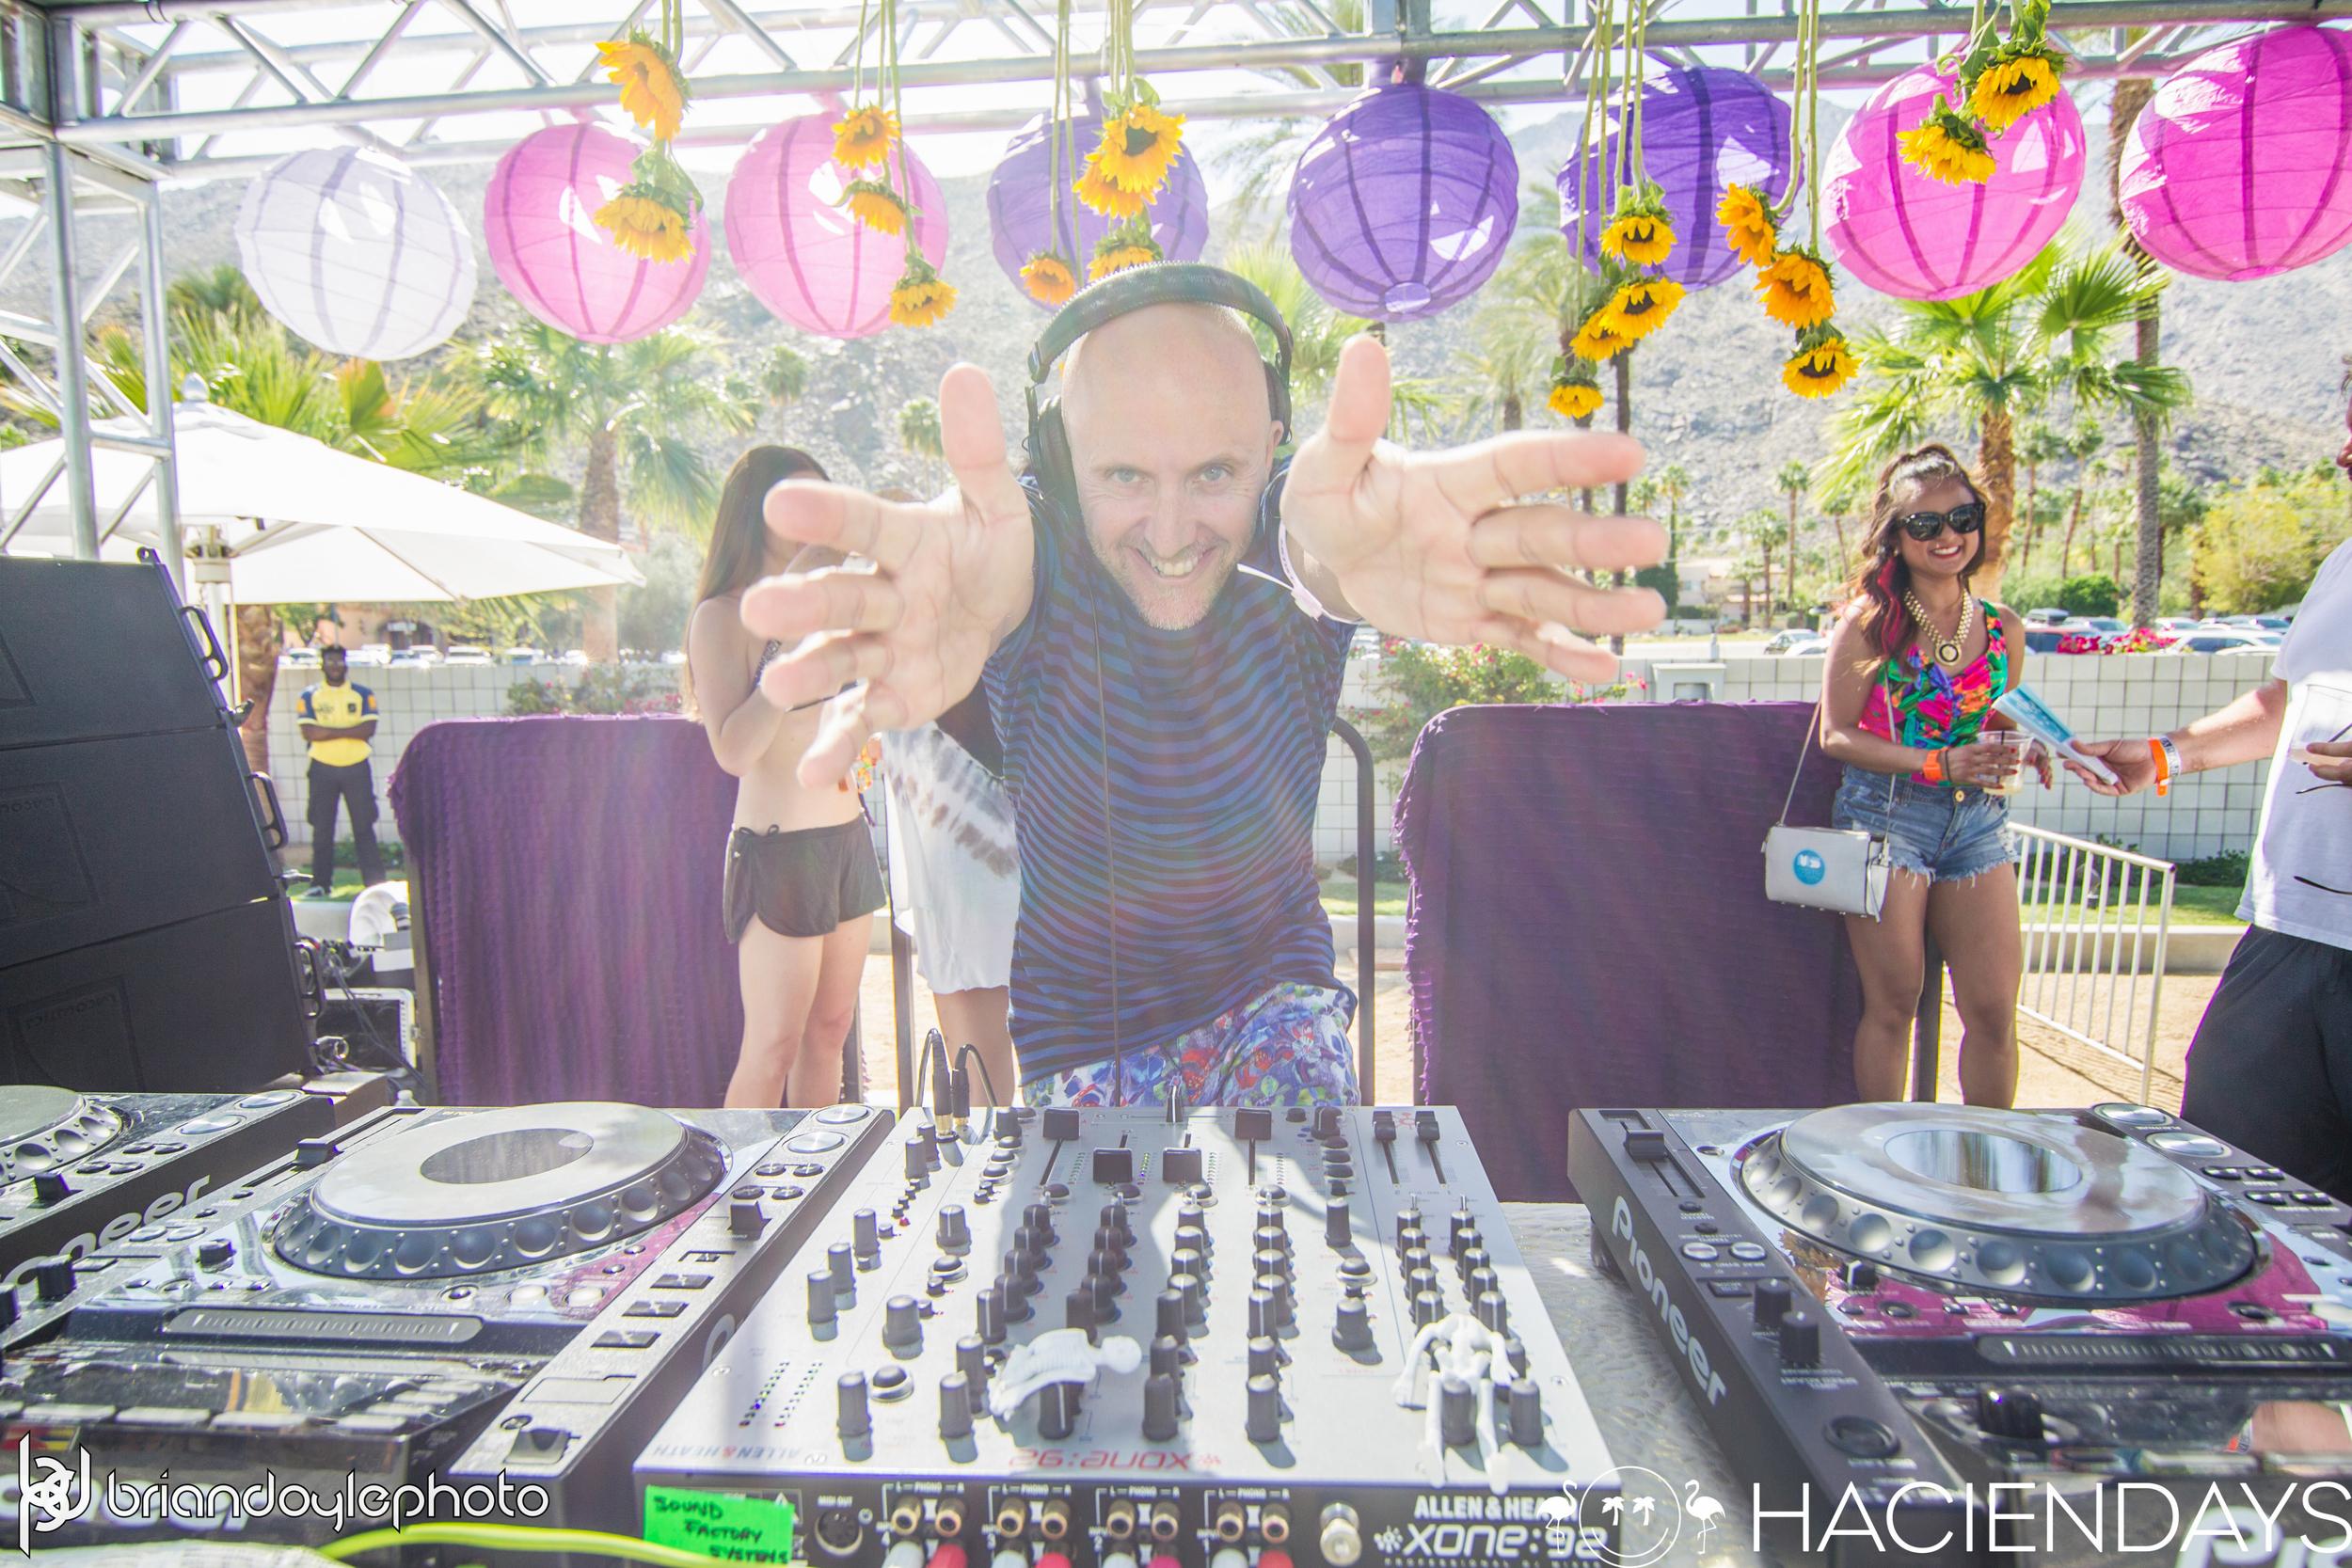 Hacienda - All Day I Dream 04.11.2015-31.jpg